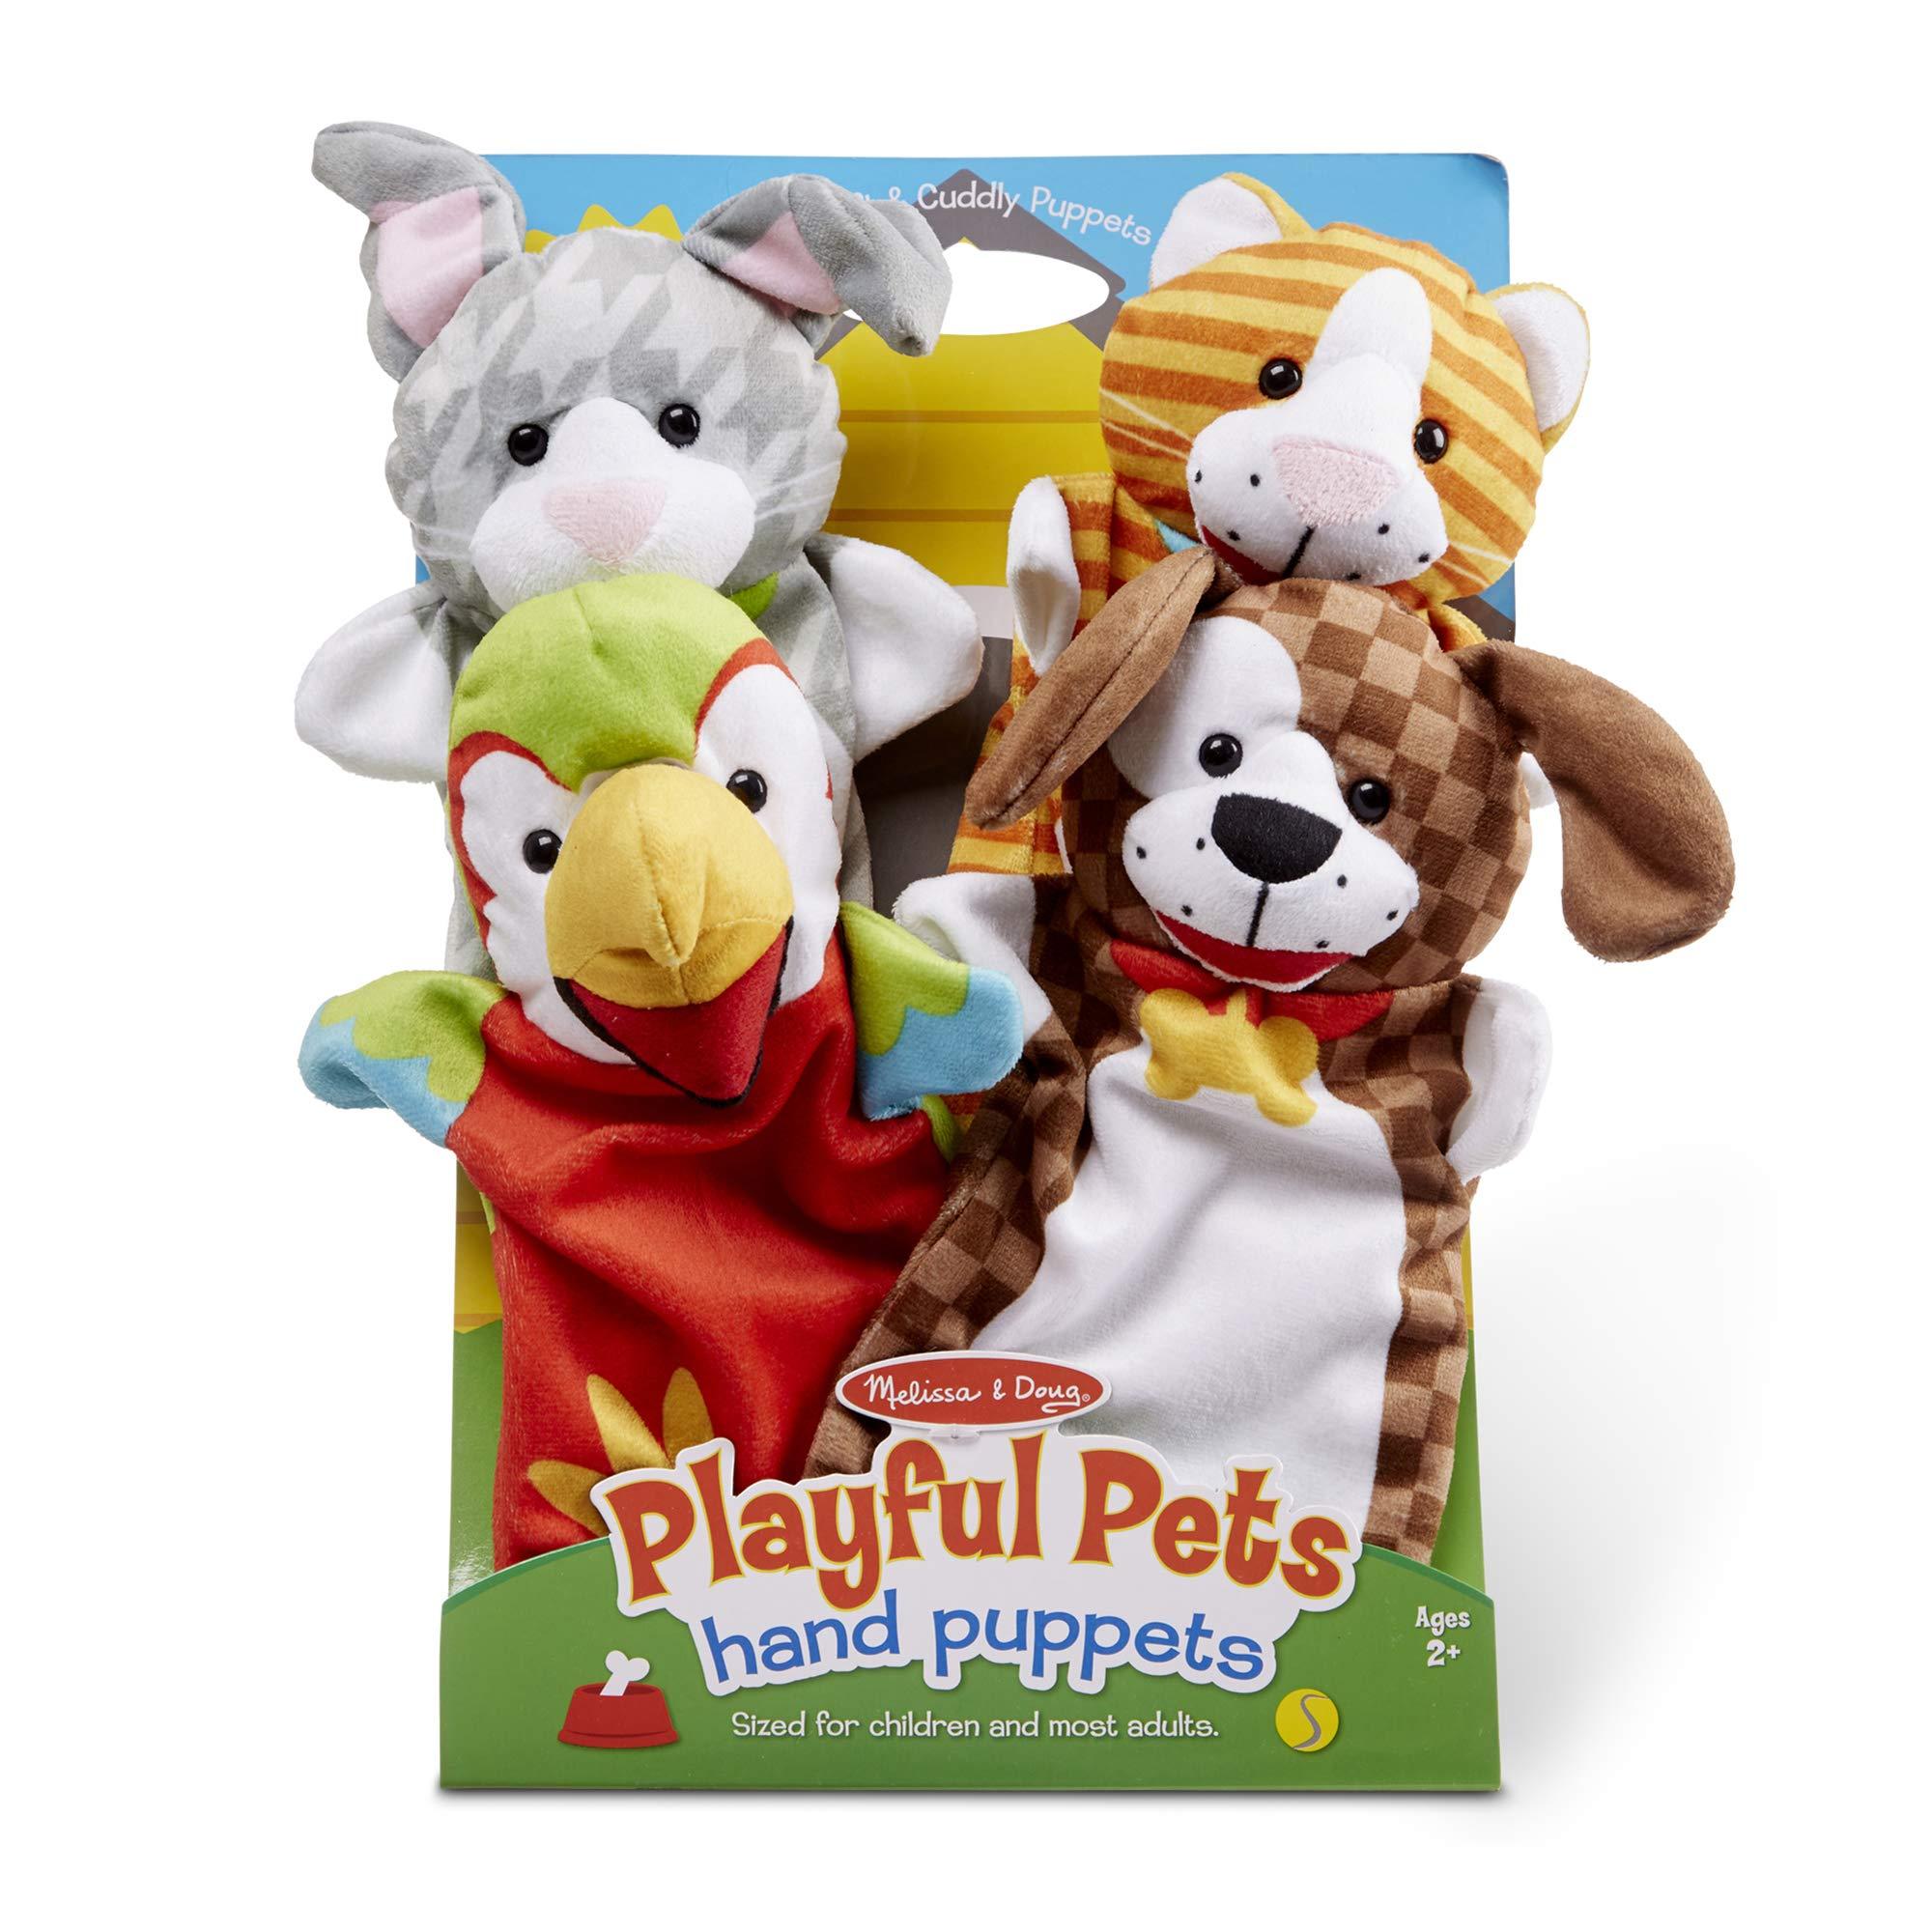 Melissa & Doug Playful Pets Hand Puppets, Puppet Sets, Rabbit, Parrot, Kitten, and Puppy, Soft Plush Material, Set of 4, 14'' H x 8.5'' W x 2'' L by Melissa & Doug